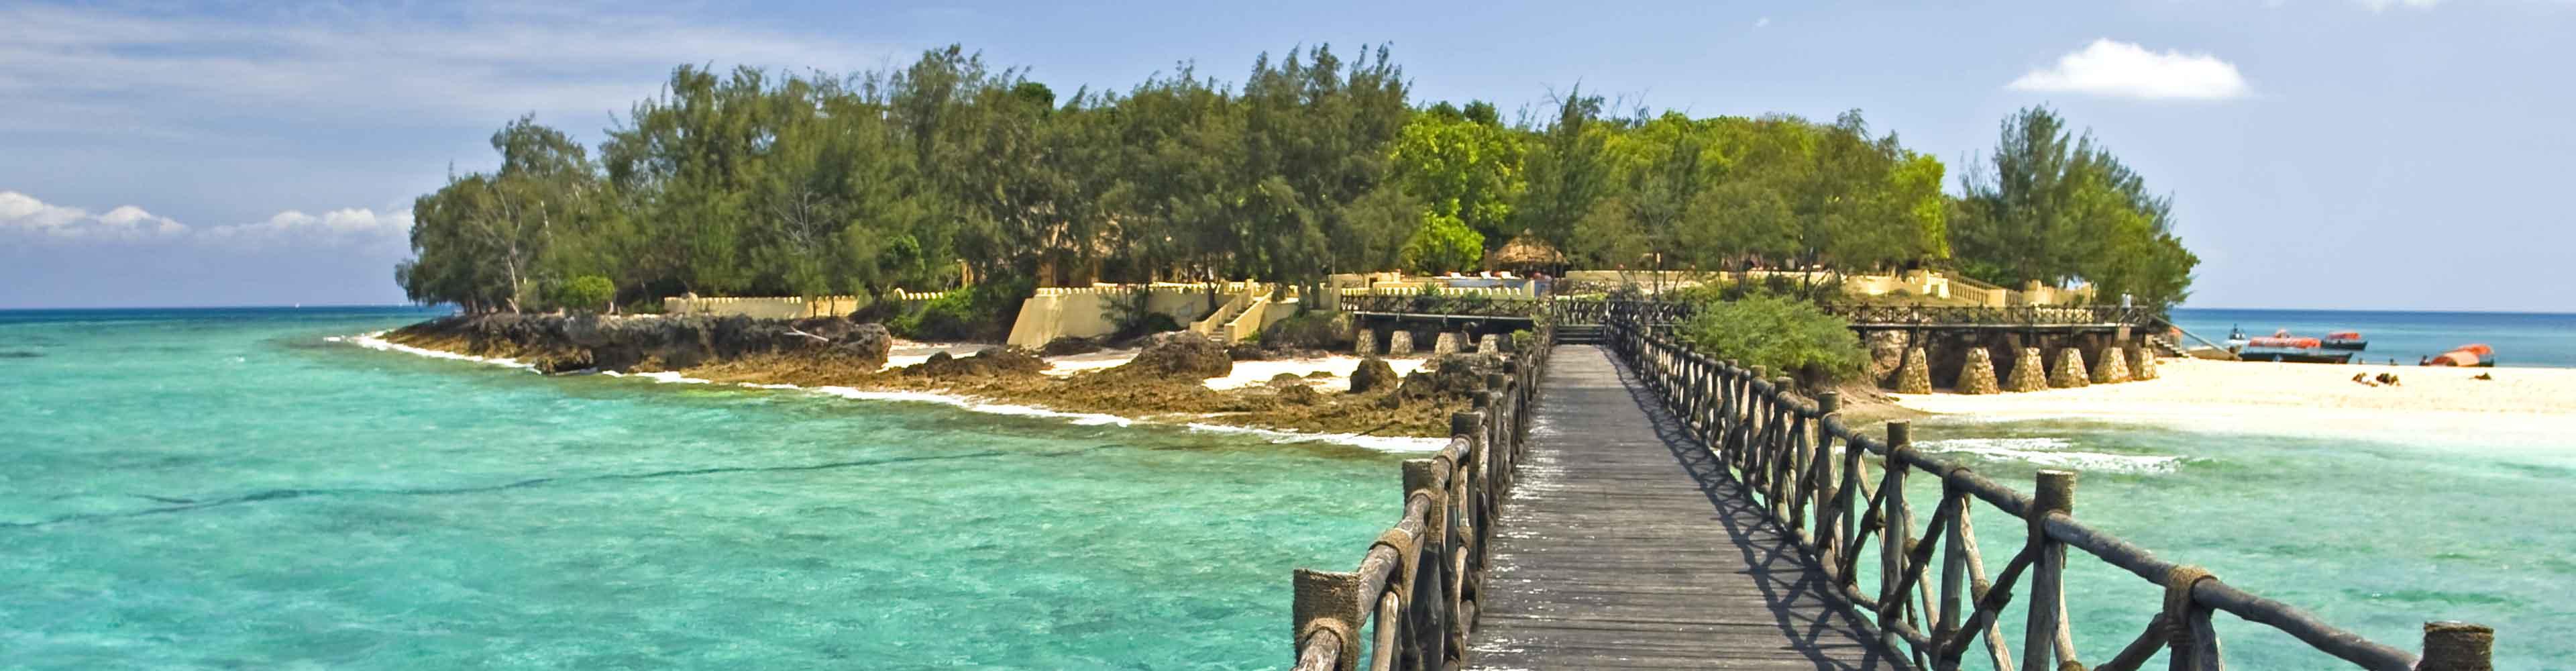 East Coast Zanzibar Experience – Independent